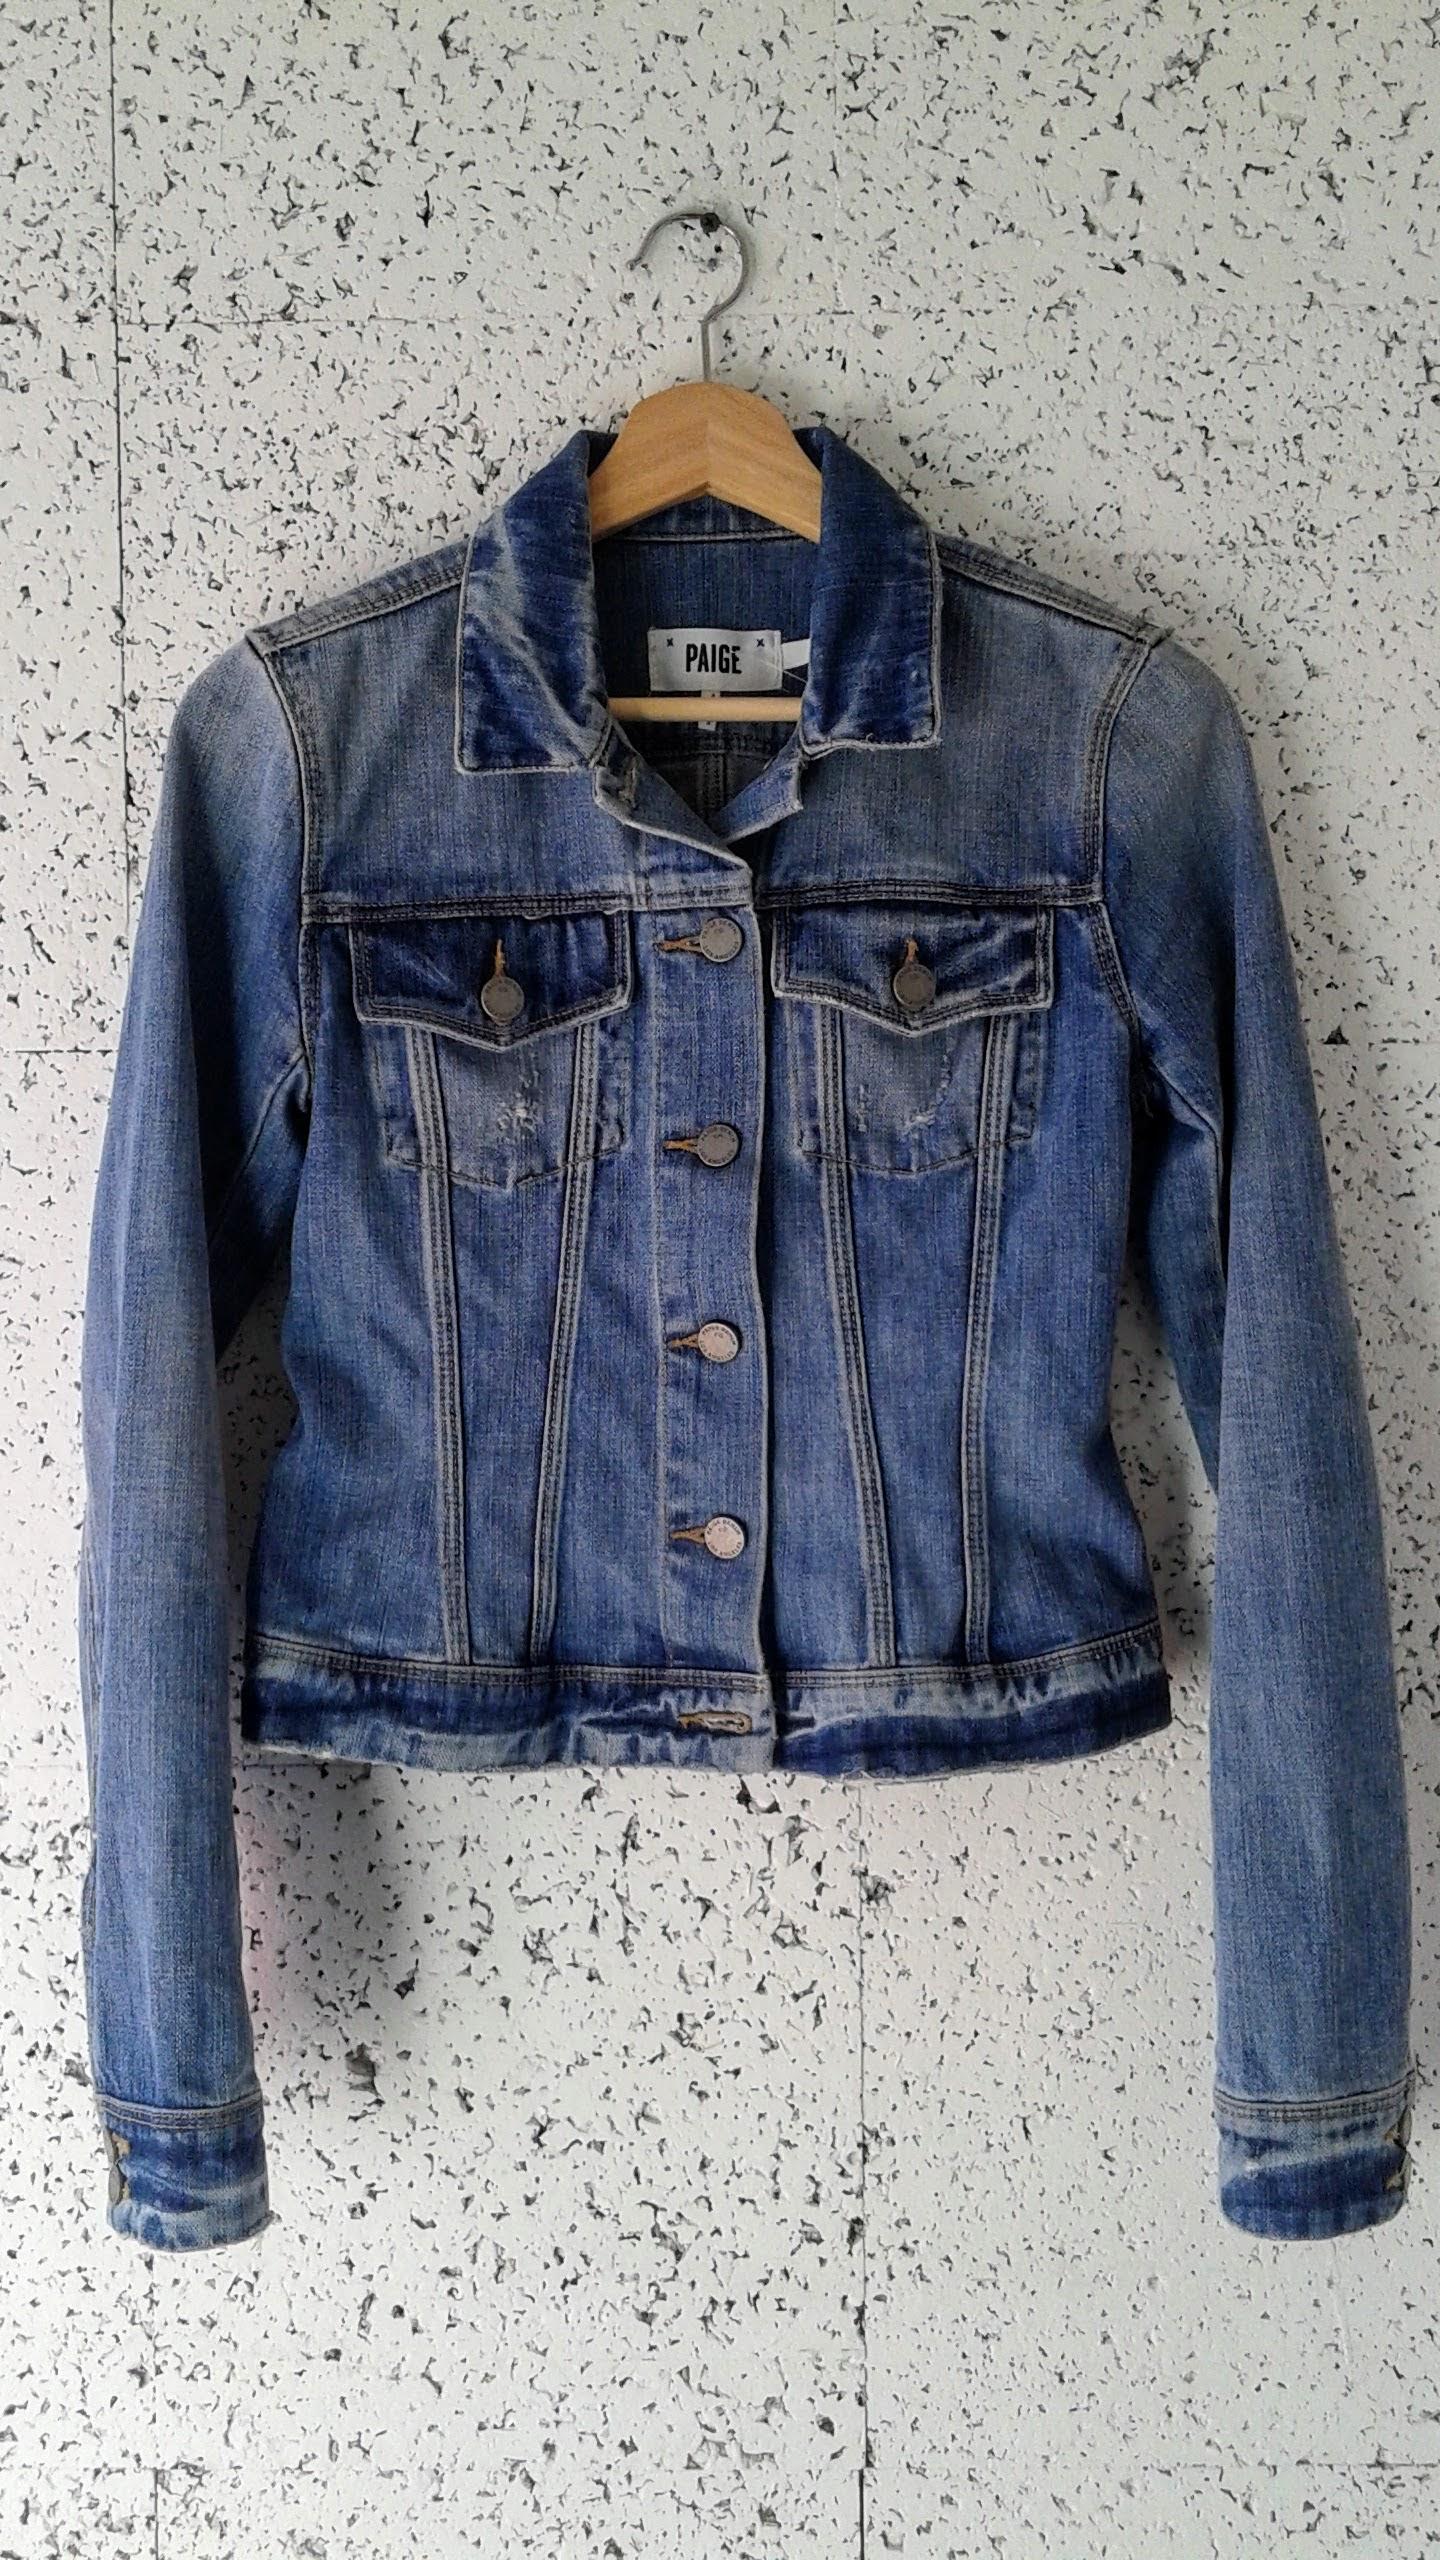 Paige jacket; Size S, $40